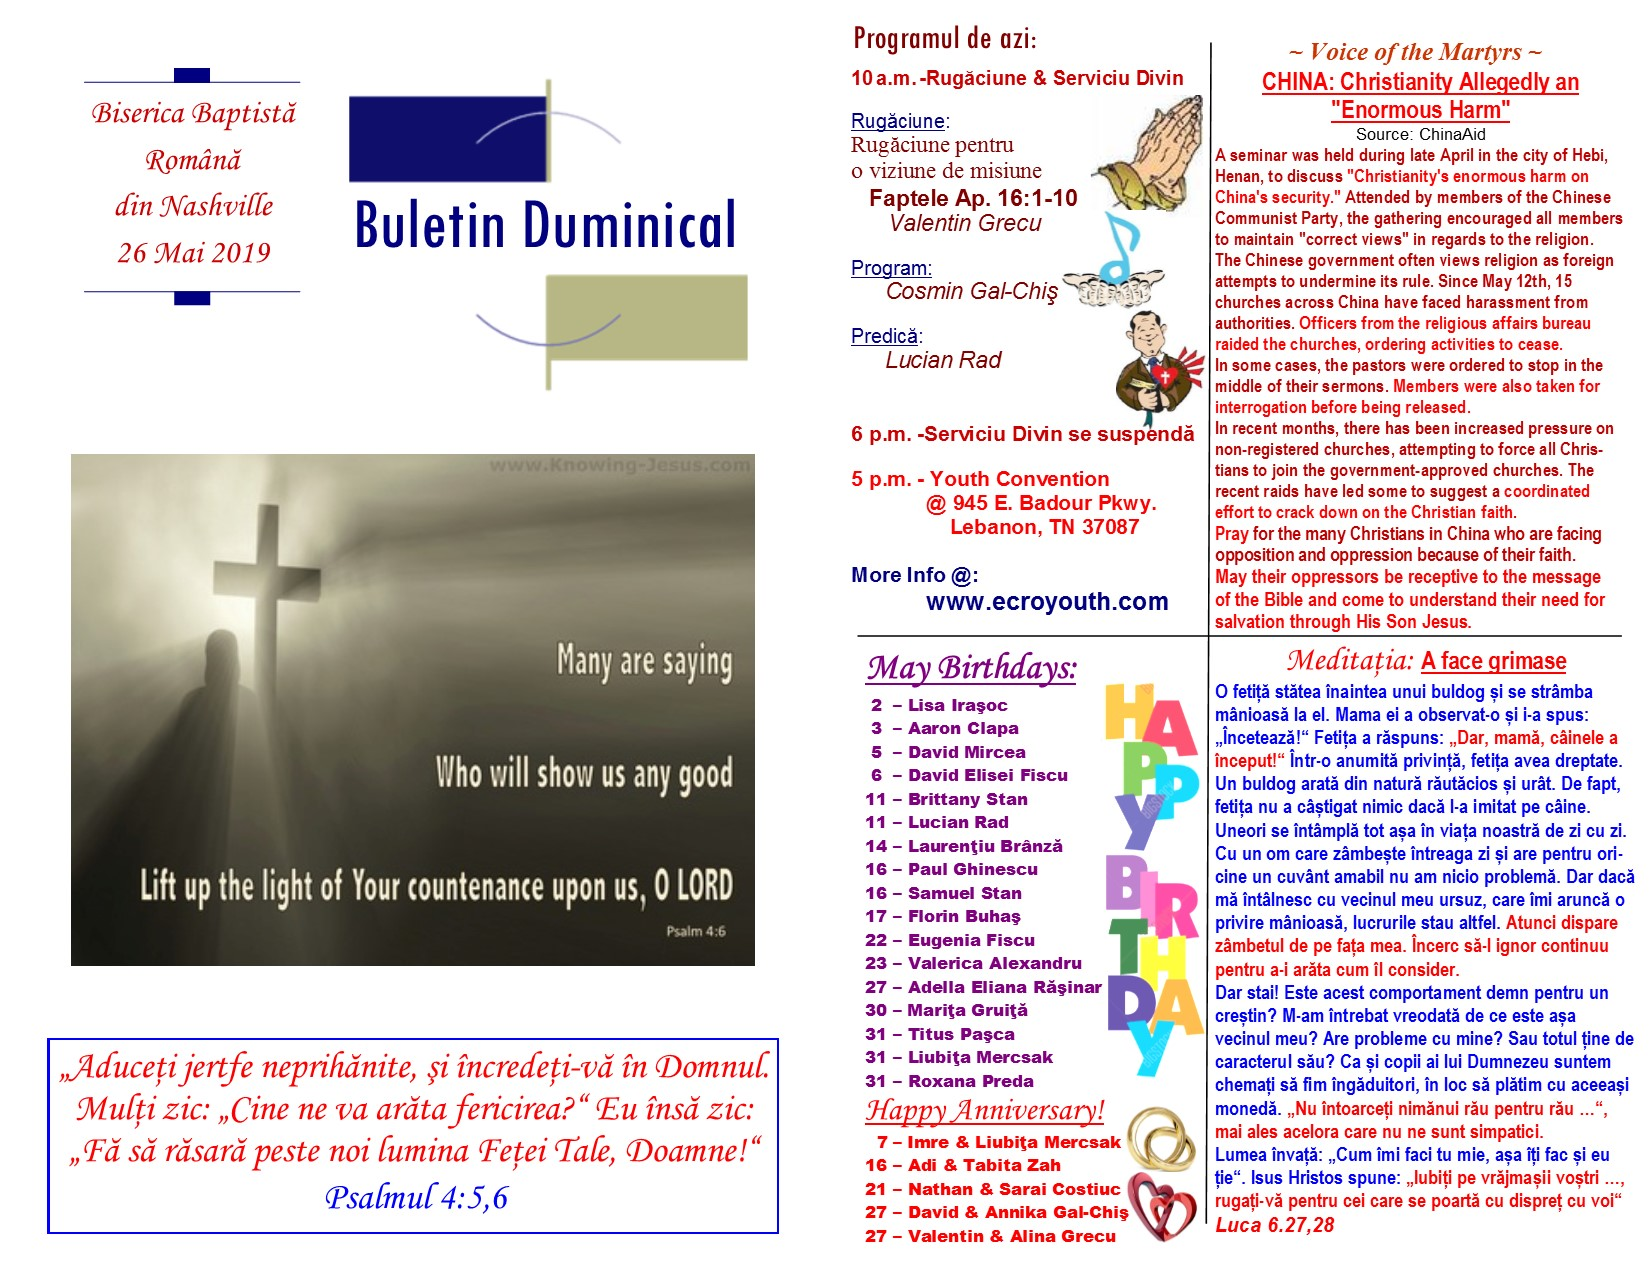 Buletin 05-26-19 page 1 & 2